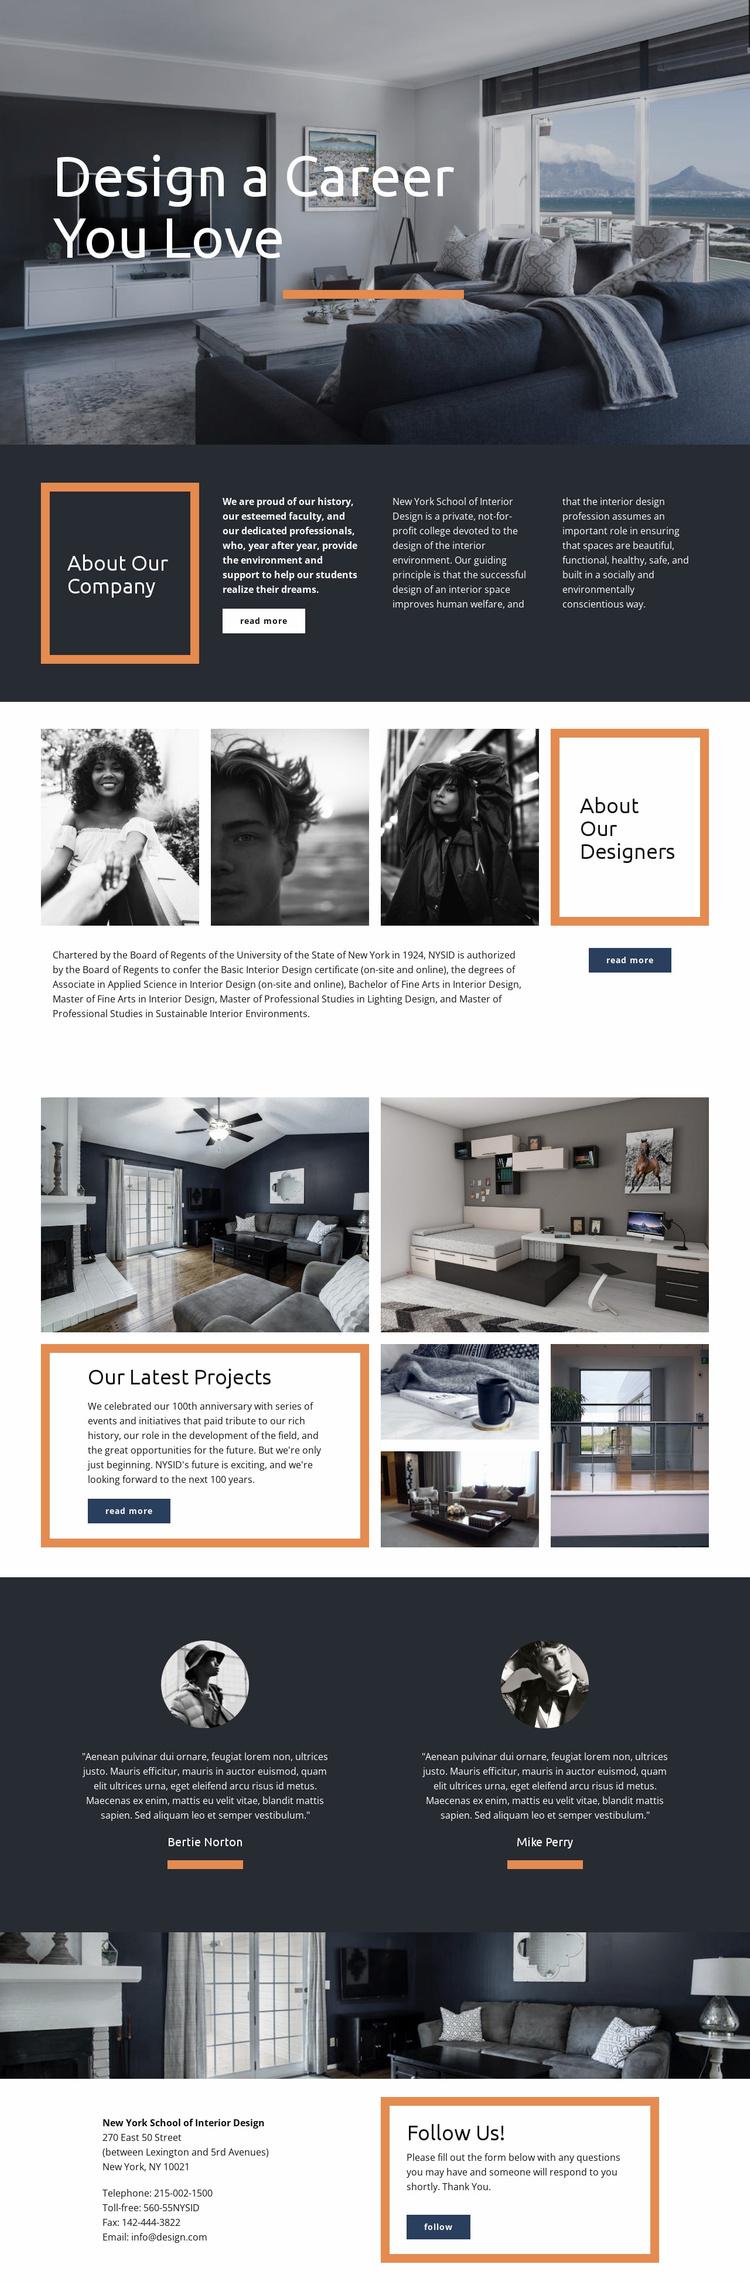 Design a Career You Love Website Template